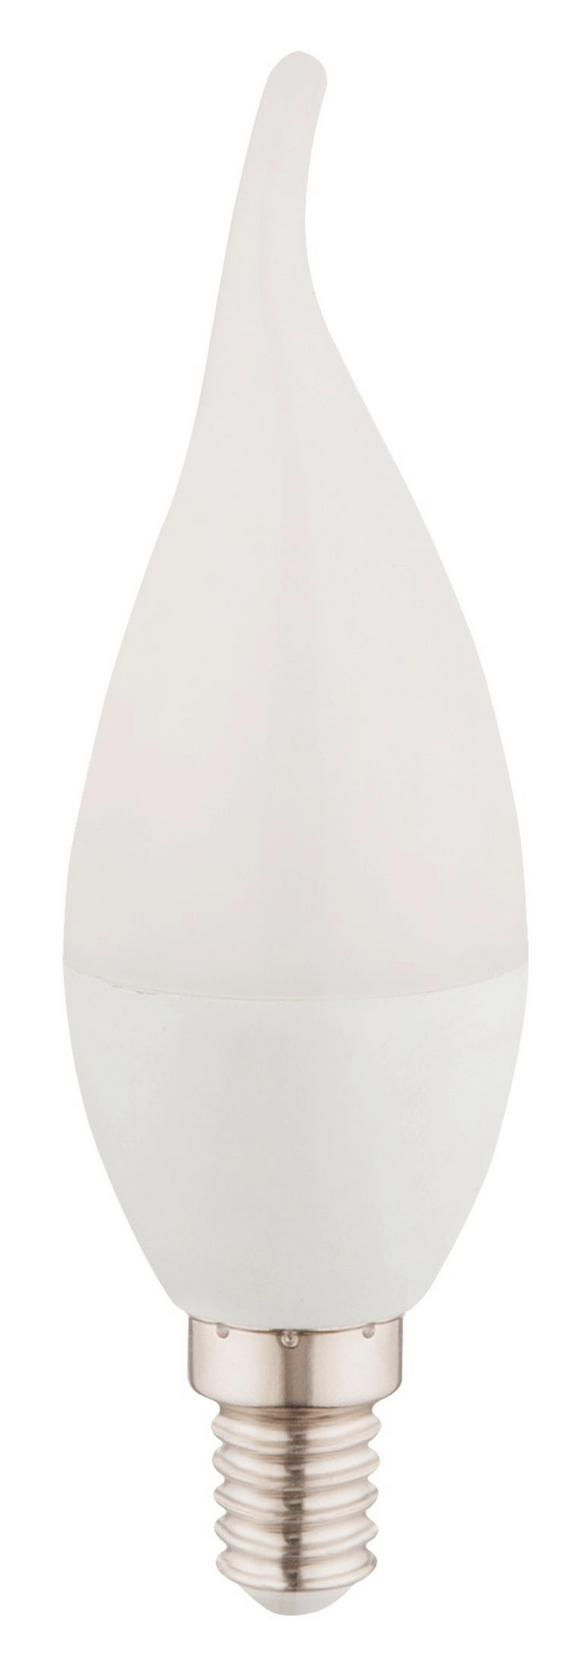 Led-žarnica 10604w-2 - opal, kovina/umetna masa (3,7/12,3cm)